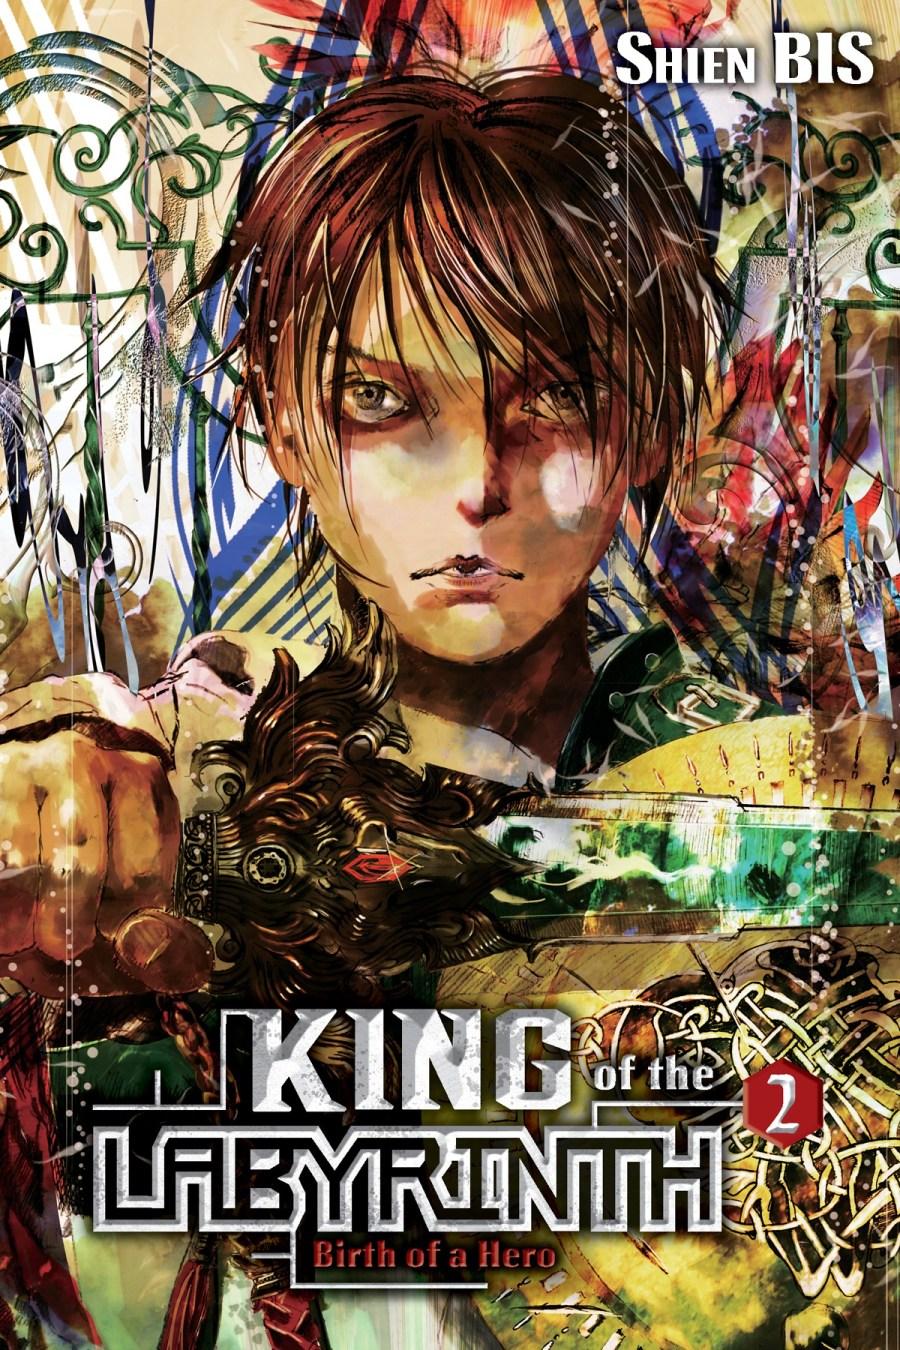 King of the LabyrinthVolume 2